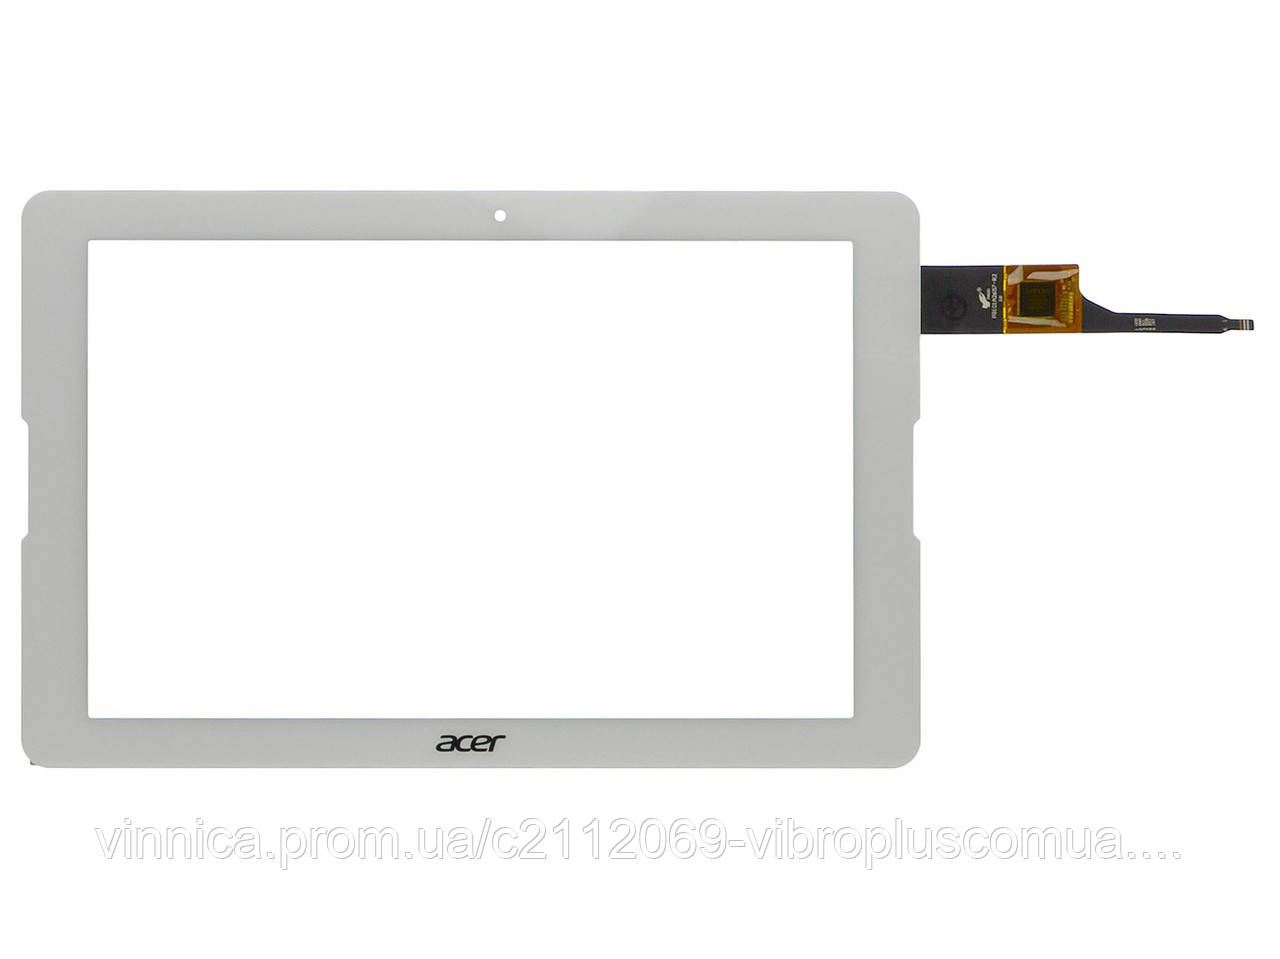 "Тачскрин (сенсор) 10.1"" Acer Iconia One B3-A20, white (белый)"